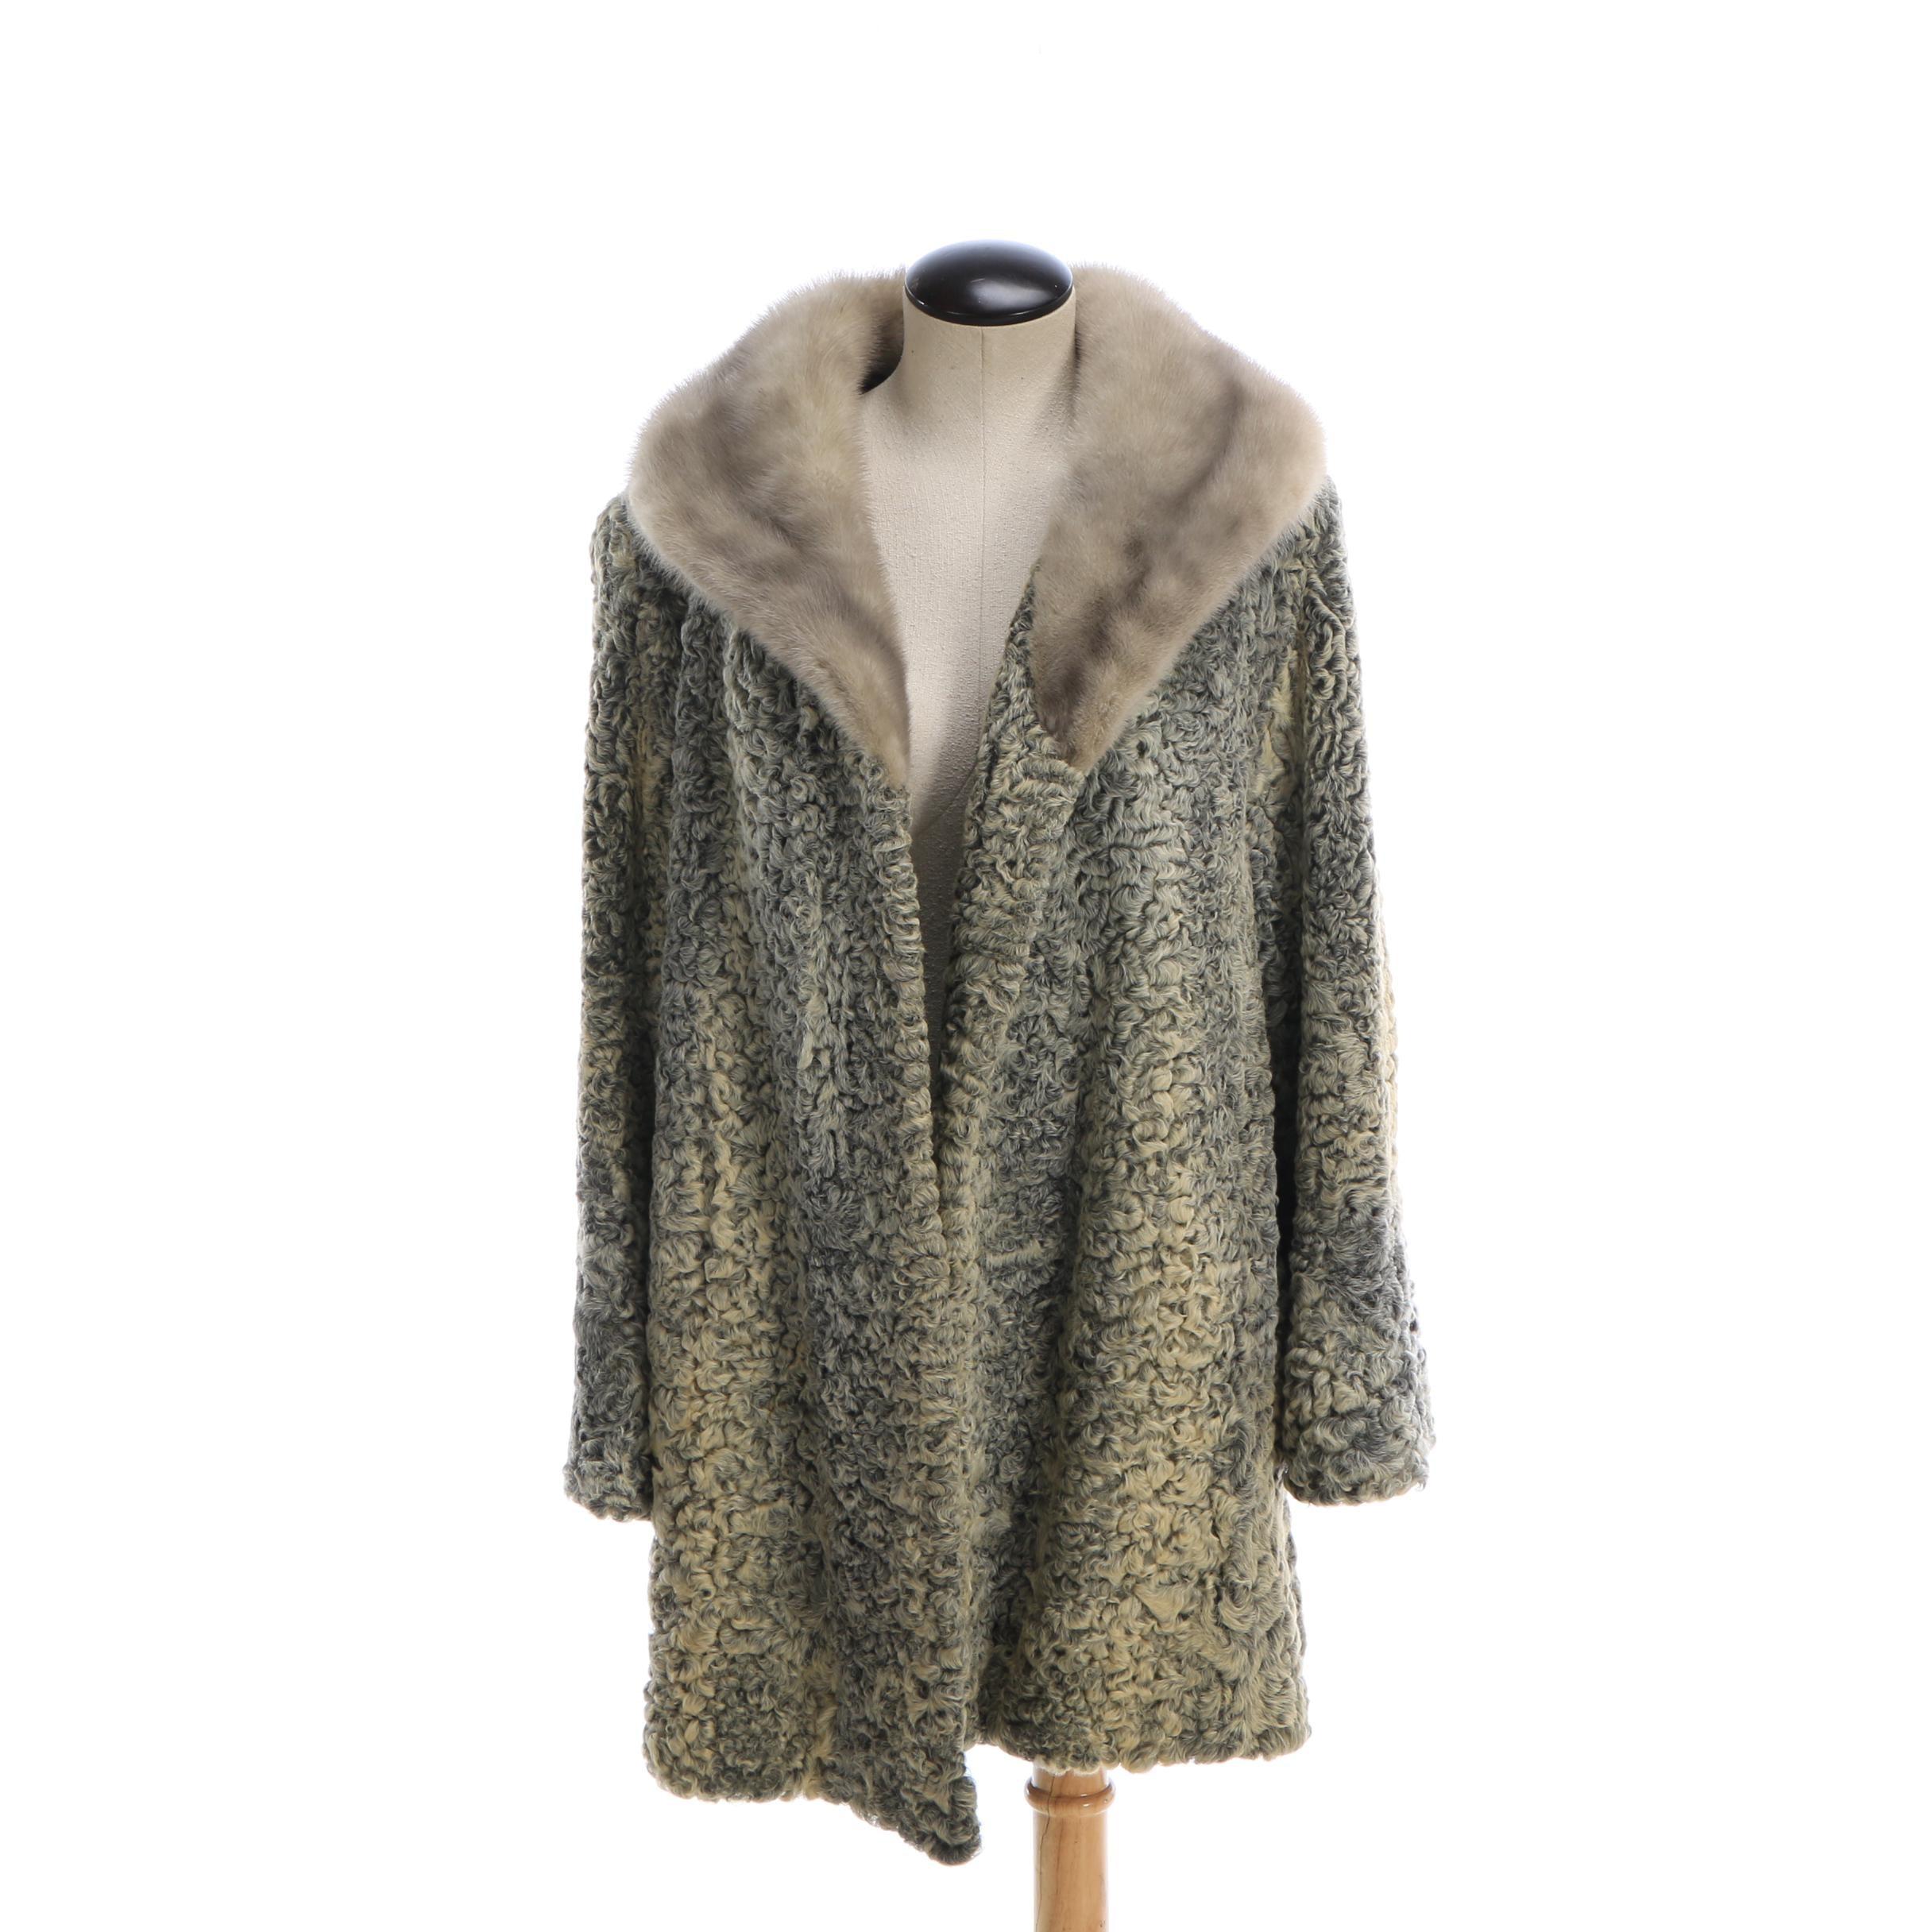 Women's Vintage Persian Lamb Fur Stroller Coat with Mink Fur Collar